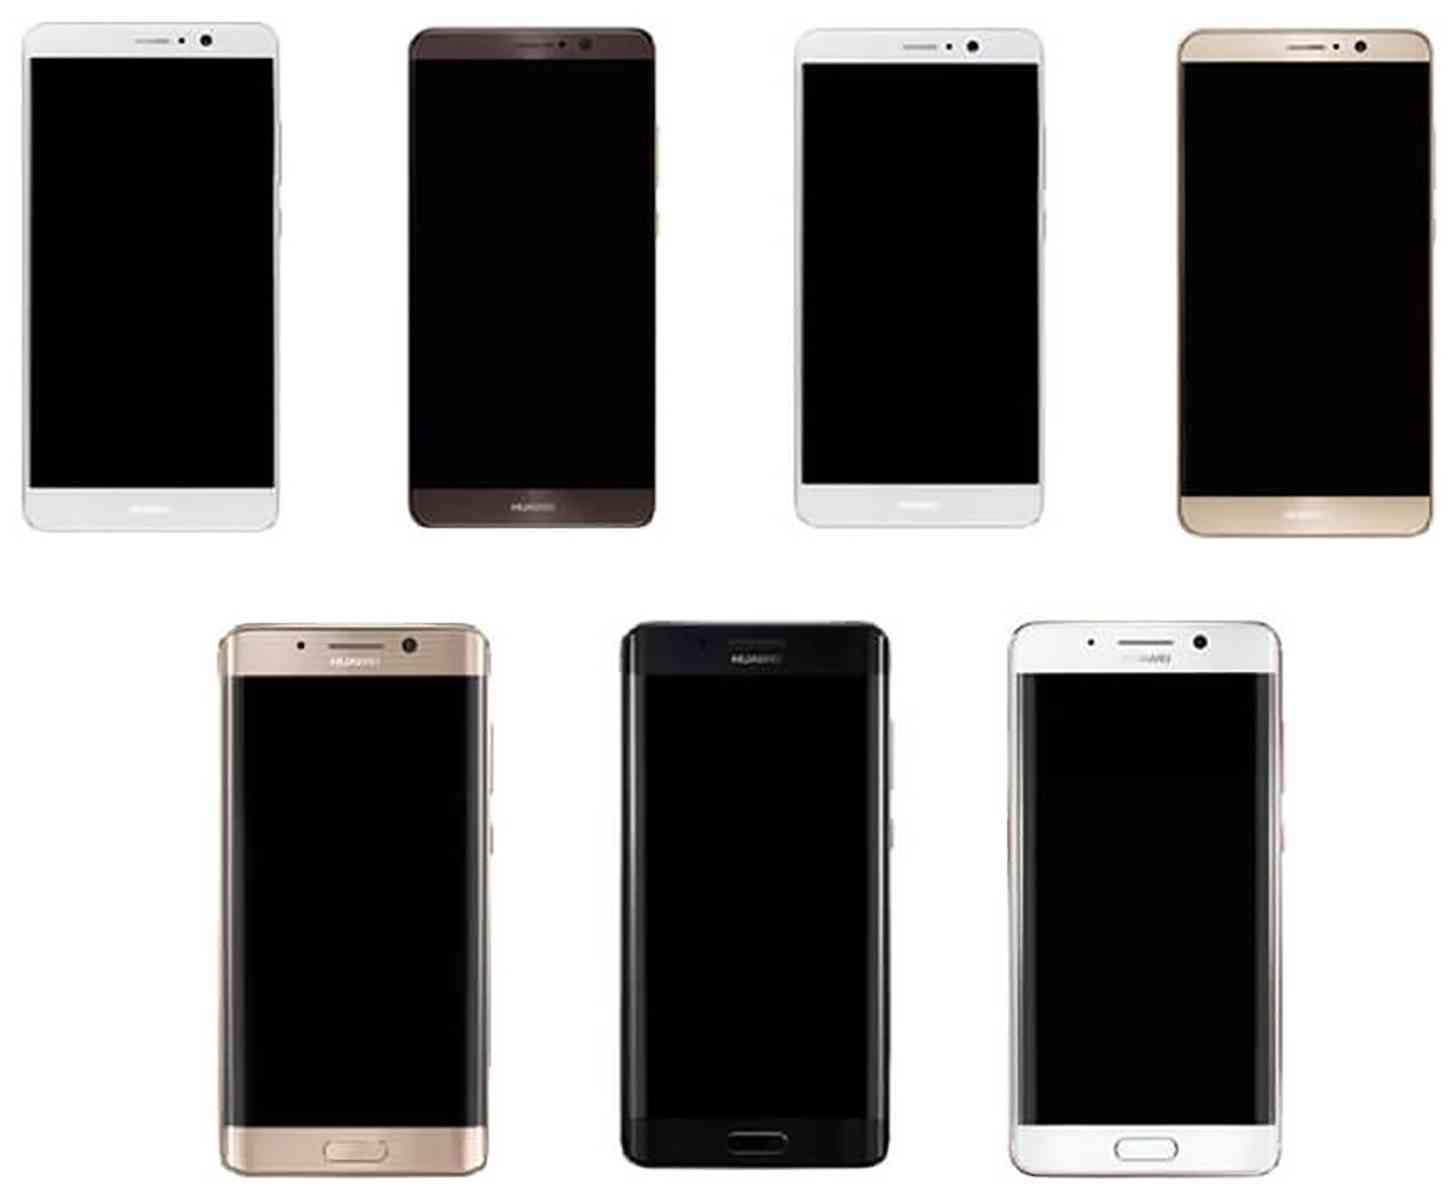 Huawei Mate 9 flat, dual curved edge display